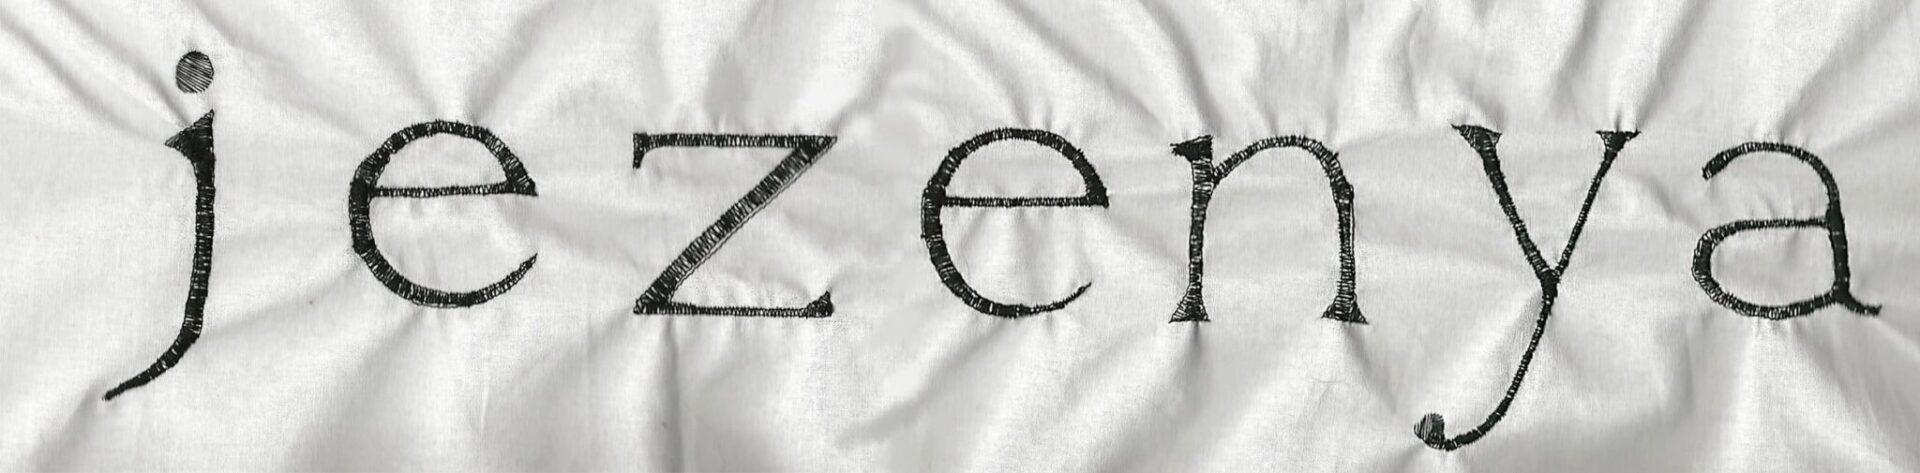 jezenya logo